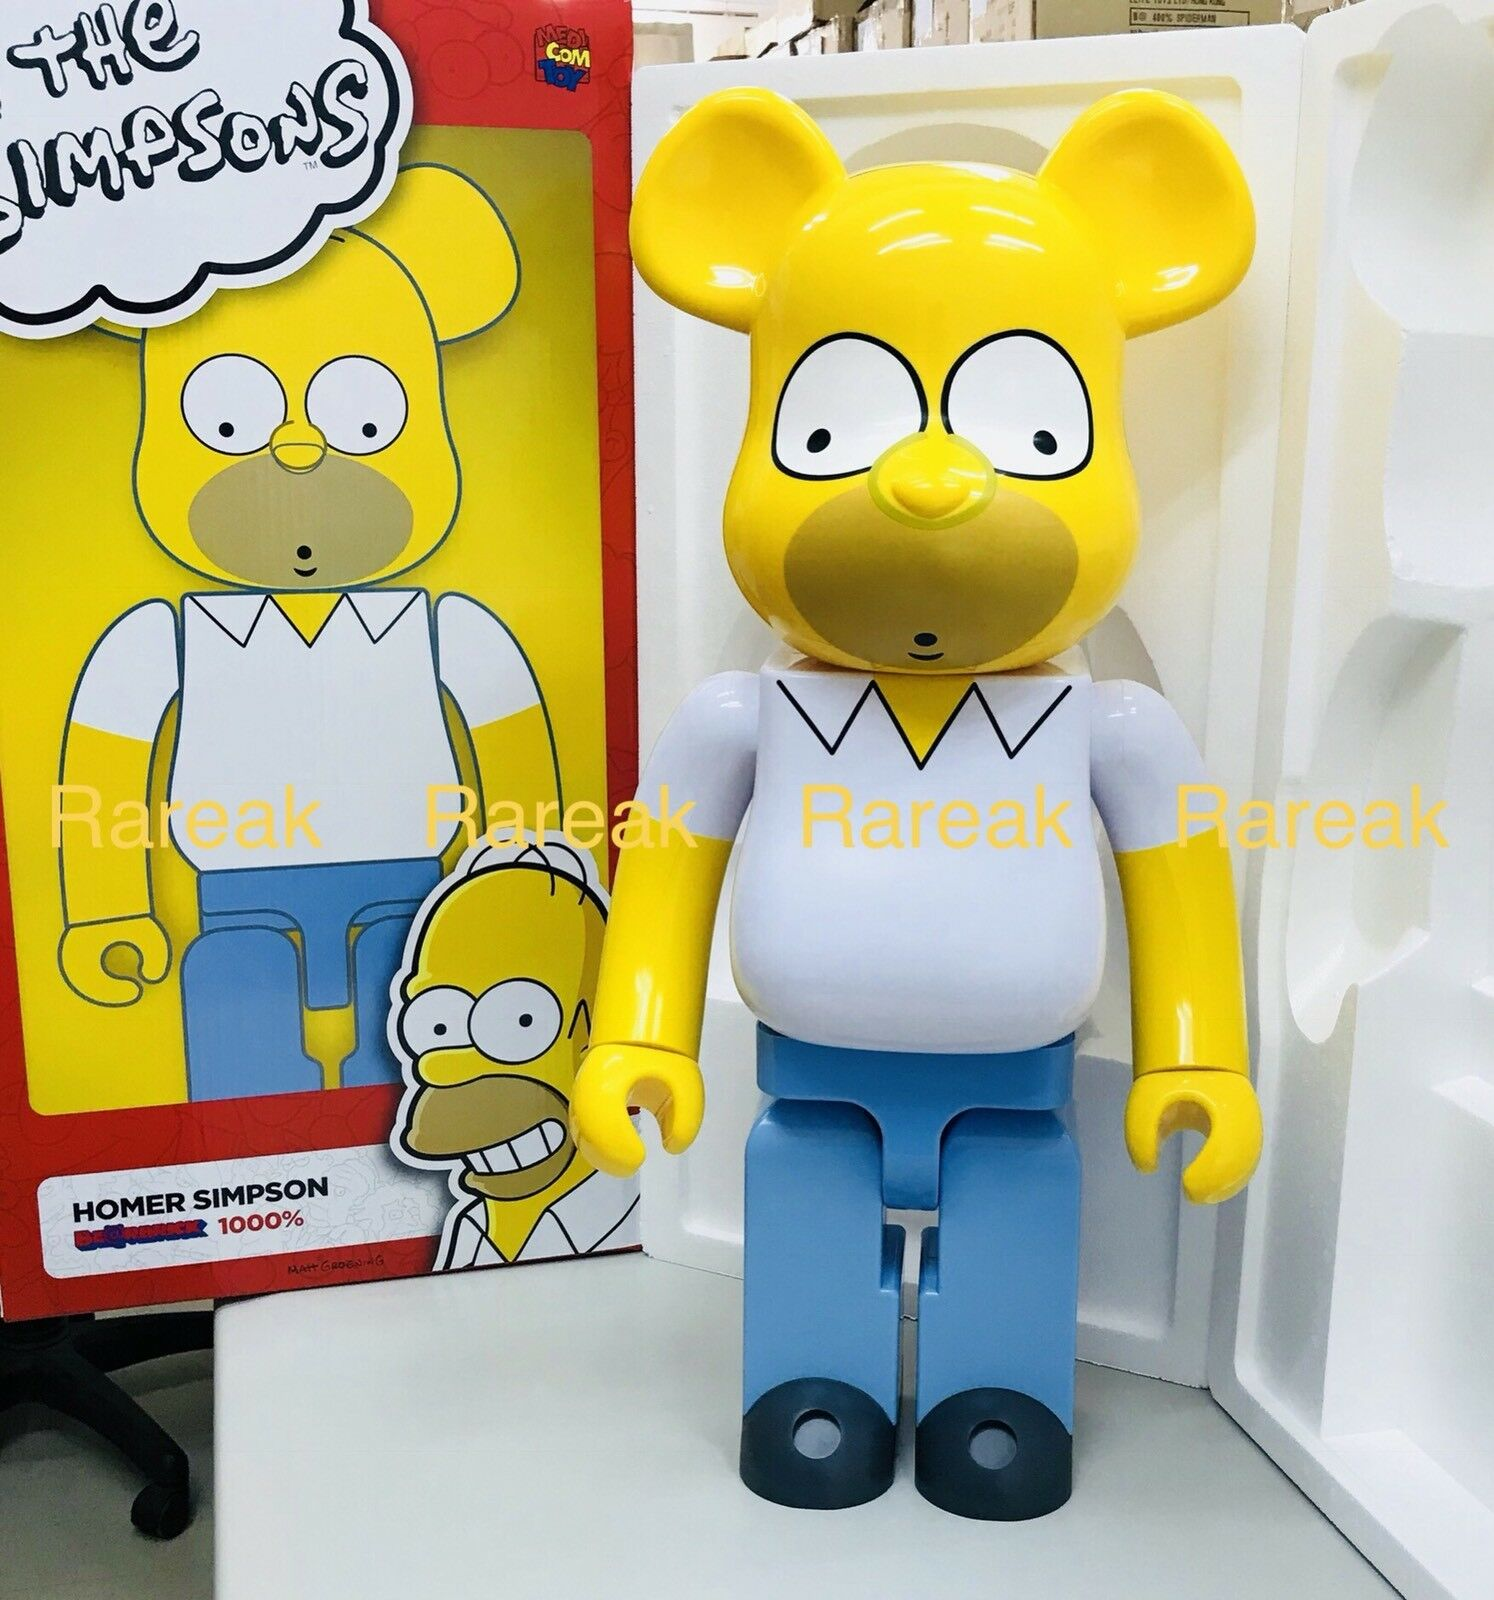 Medicom 2018 Be@rbrick Fox 1000% de los Simpsons Pantuflas de Homero Simpson Bearbrick 1pc